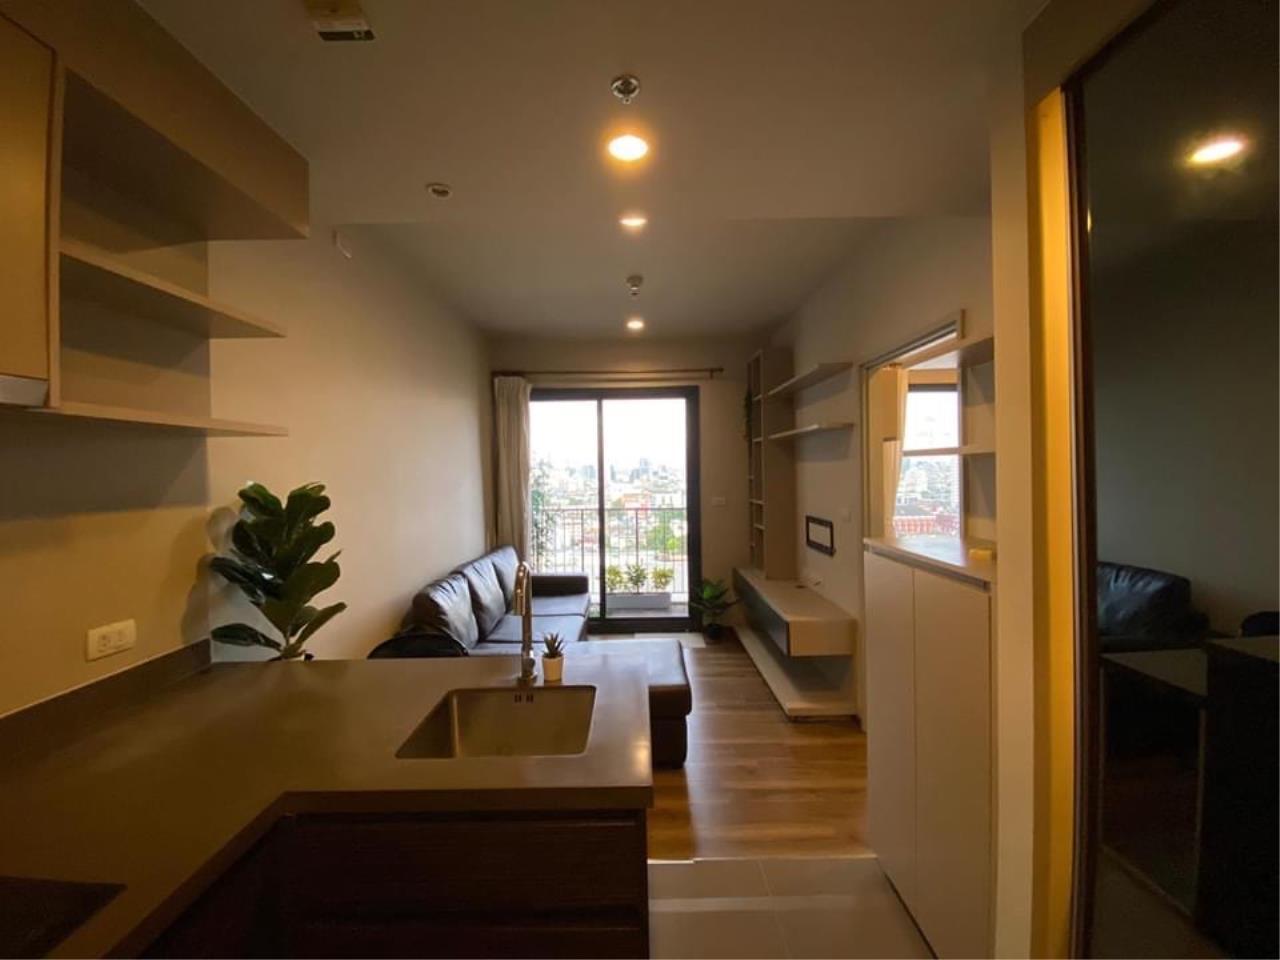 Agent - Phapayawarin Agency's Onyx Phaholyothin for Rent, 1 Bedroom 1 Bathroom, 31 Sq.m., BTS Saphan Khwai 2